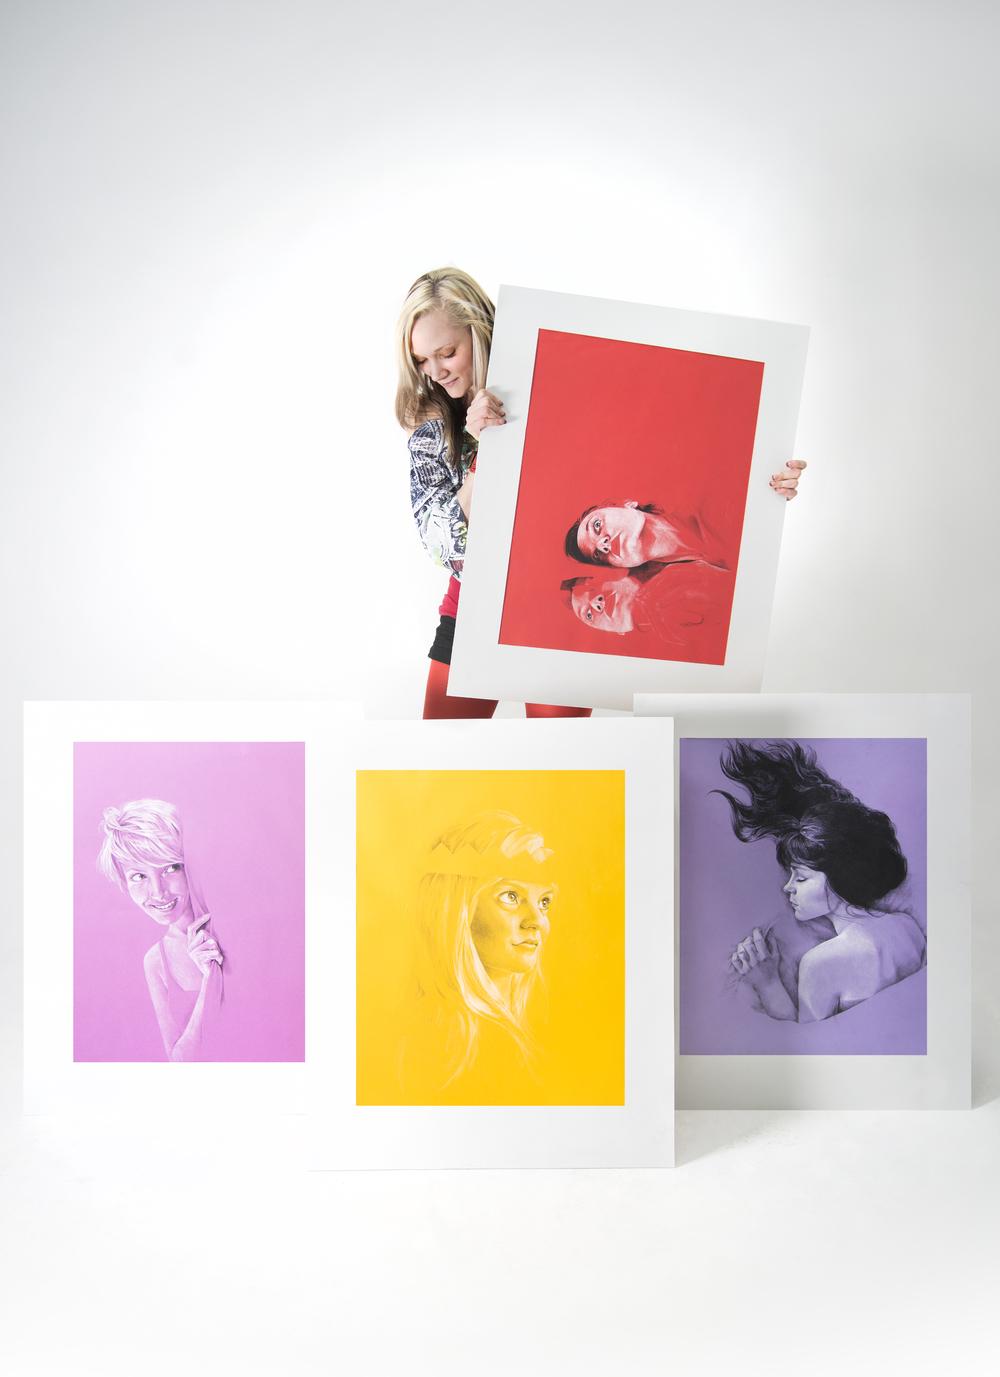 Charcoal portraits by Chavilah Bennett.  Photograph by Sara Santillan